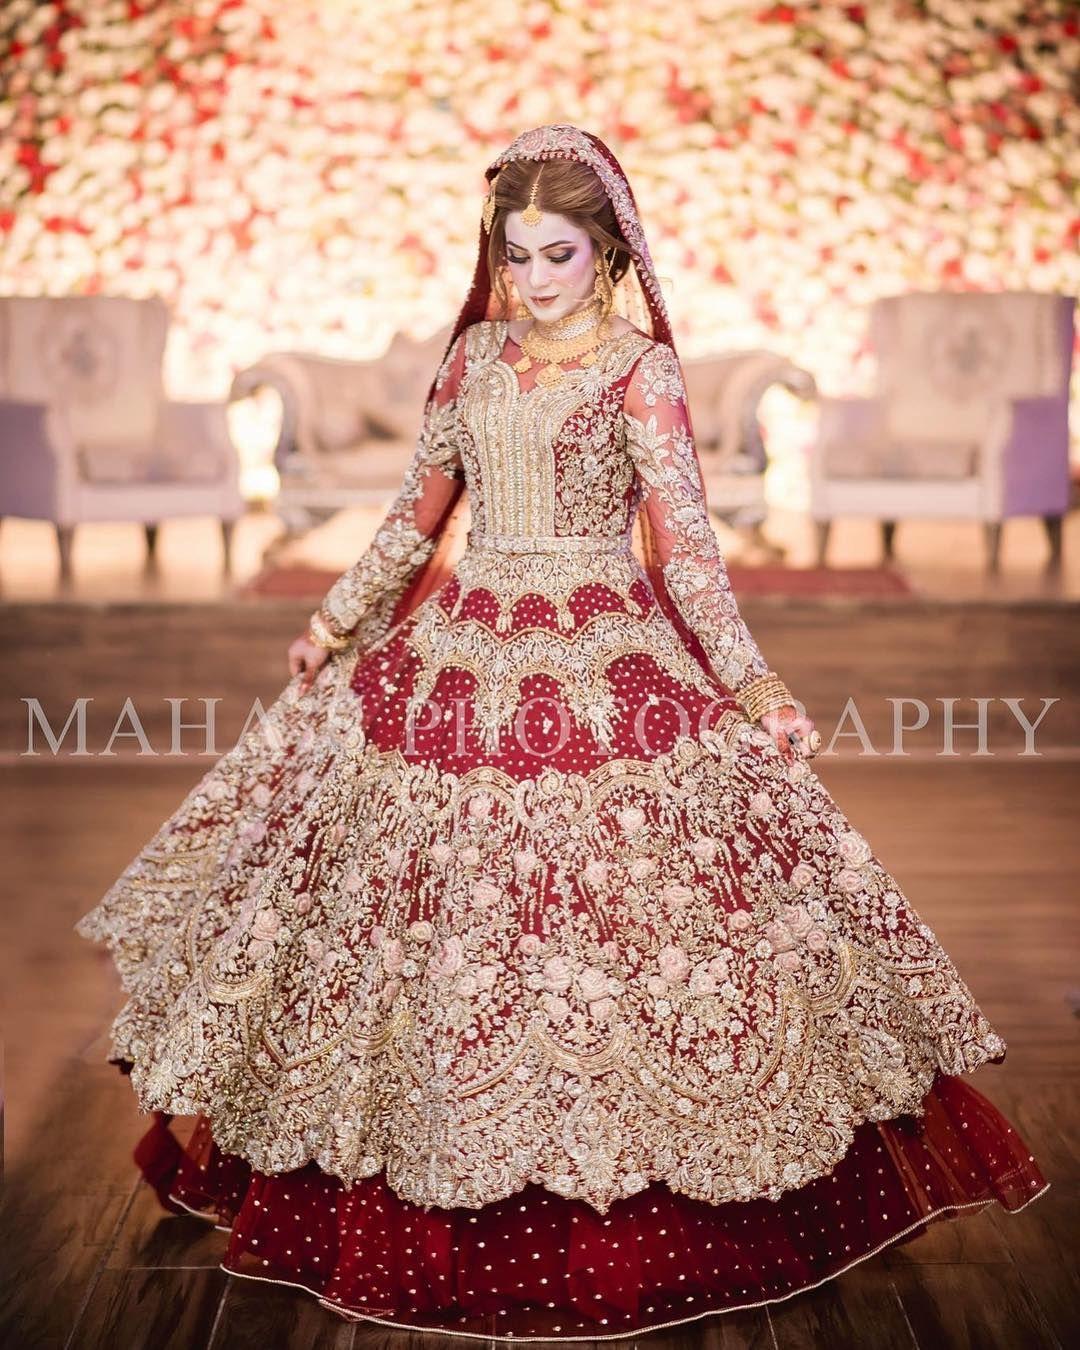 Bride Of The Day Mahasphotography Weddingphotography Seniorartists Xproductionsmedia Bridal Dresses Pakistan Red Bridal Dress Pakistani Bridal Dresses,Black Women Wedding Dresses 2020